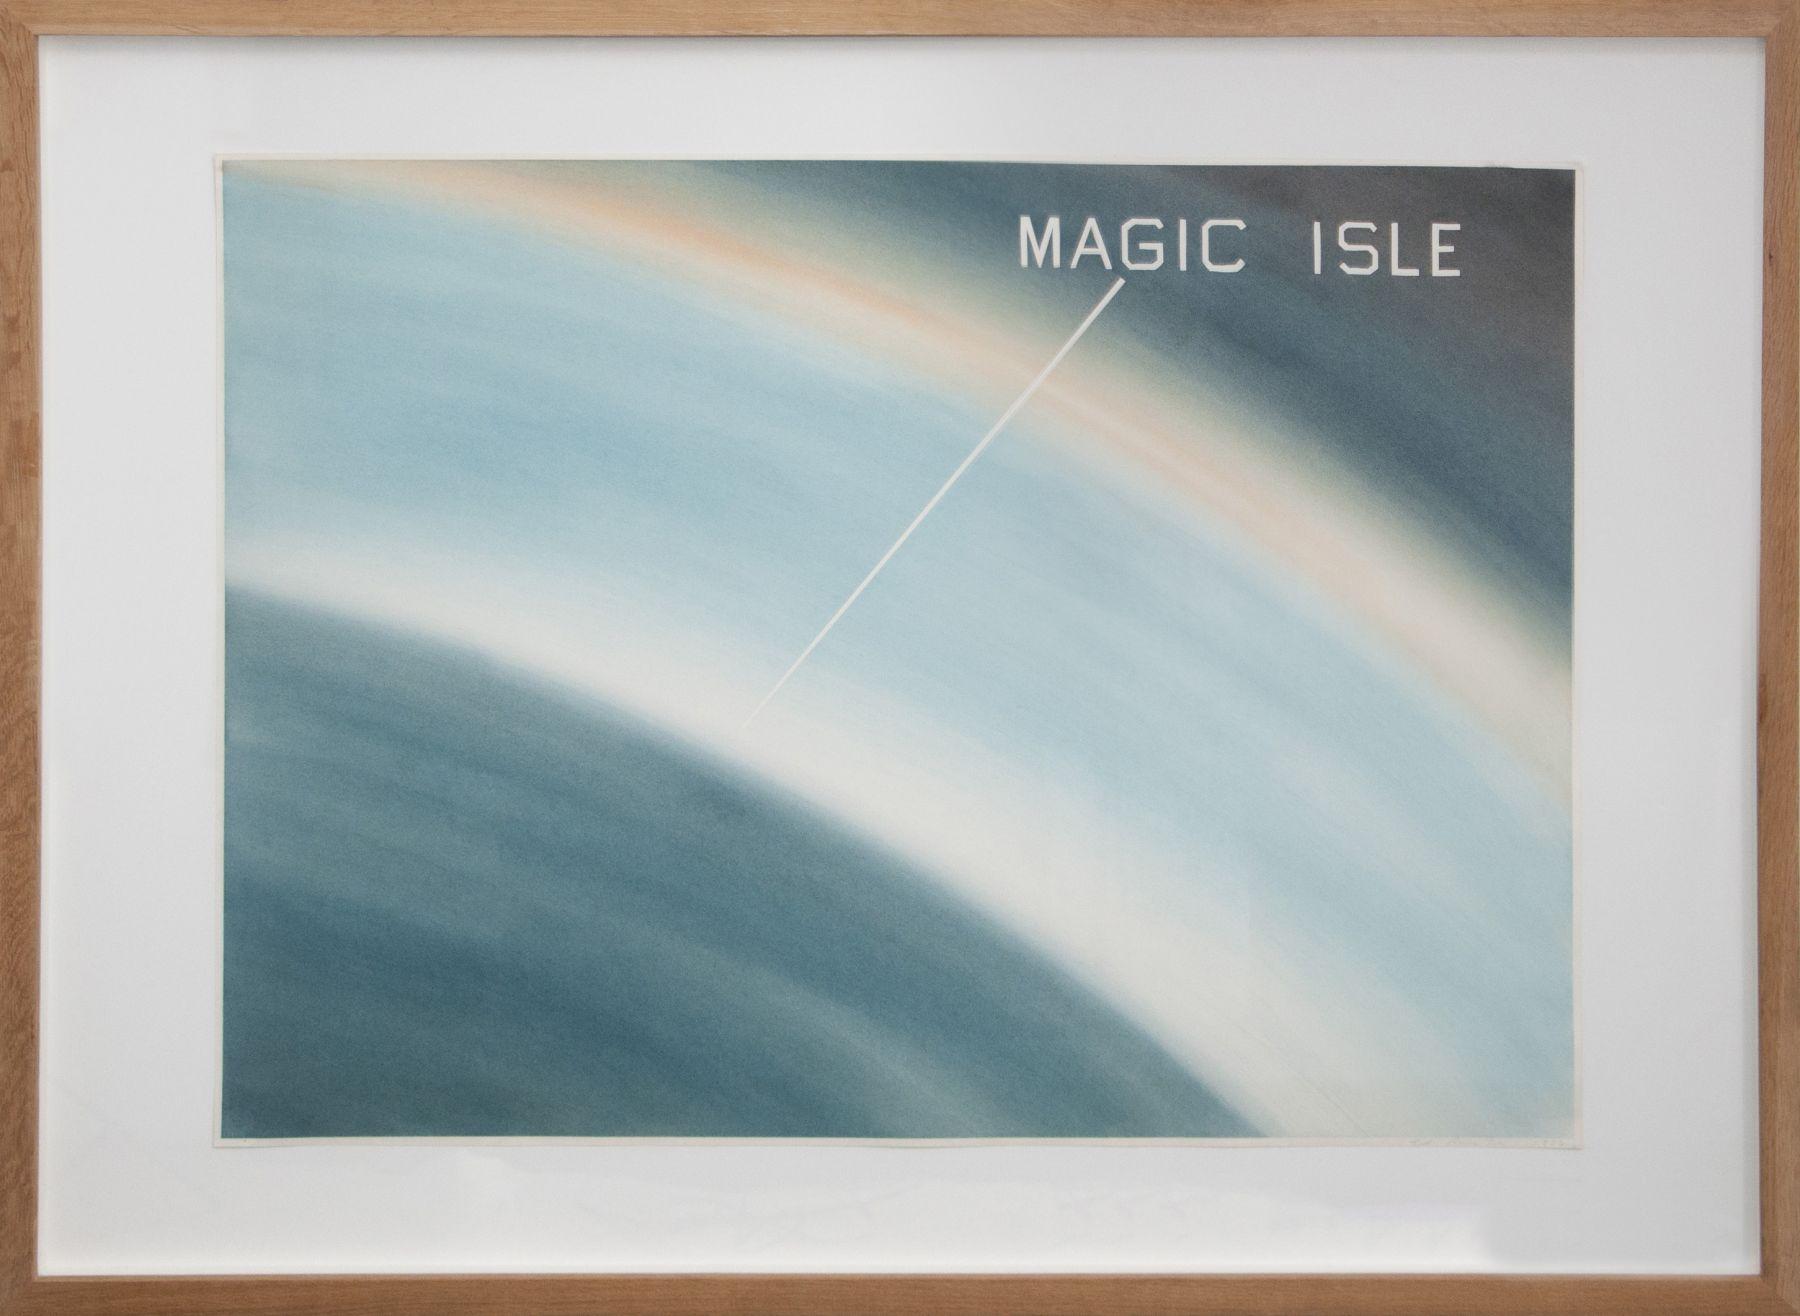 "Ed Ruscha_ Magic Isle, 1982 1973 (30"" x 40"") Frame - Casterline|Goodman Gallery.jpg"